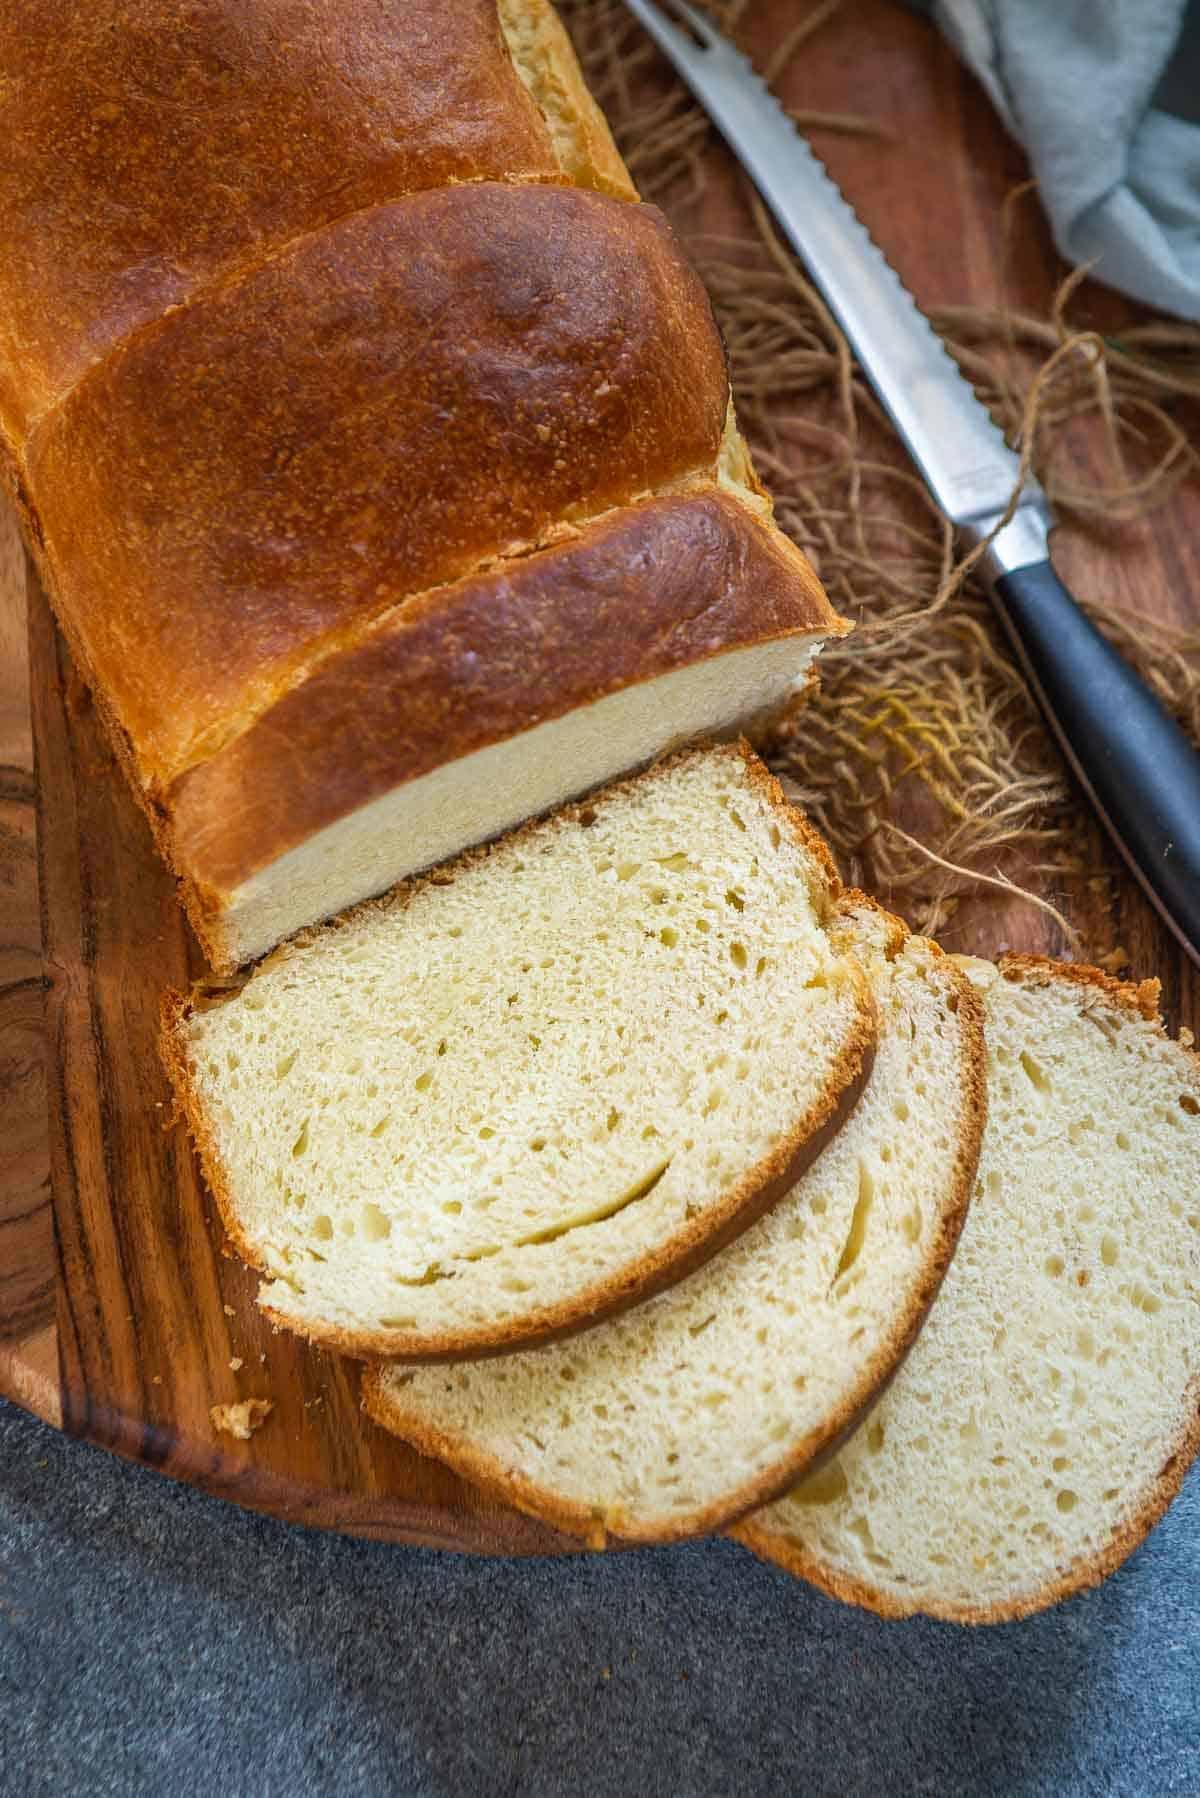 Sliced Japanese milk bread.